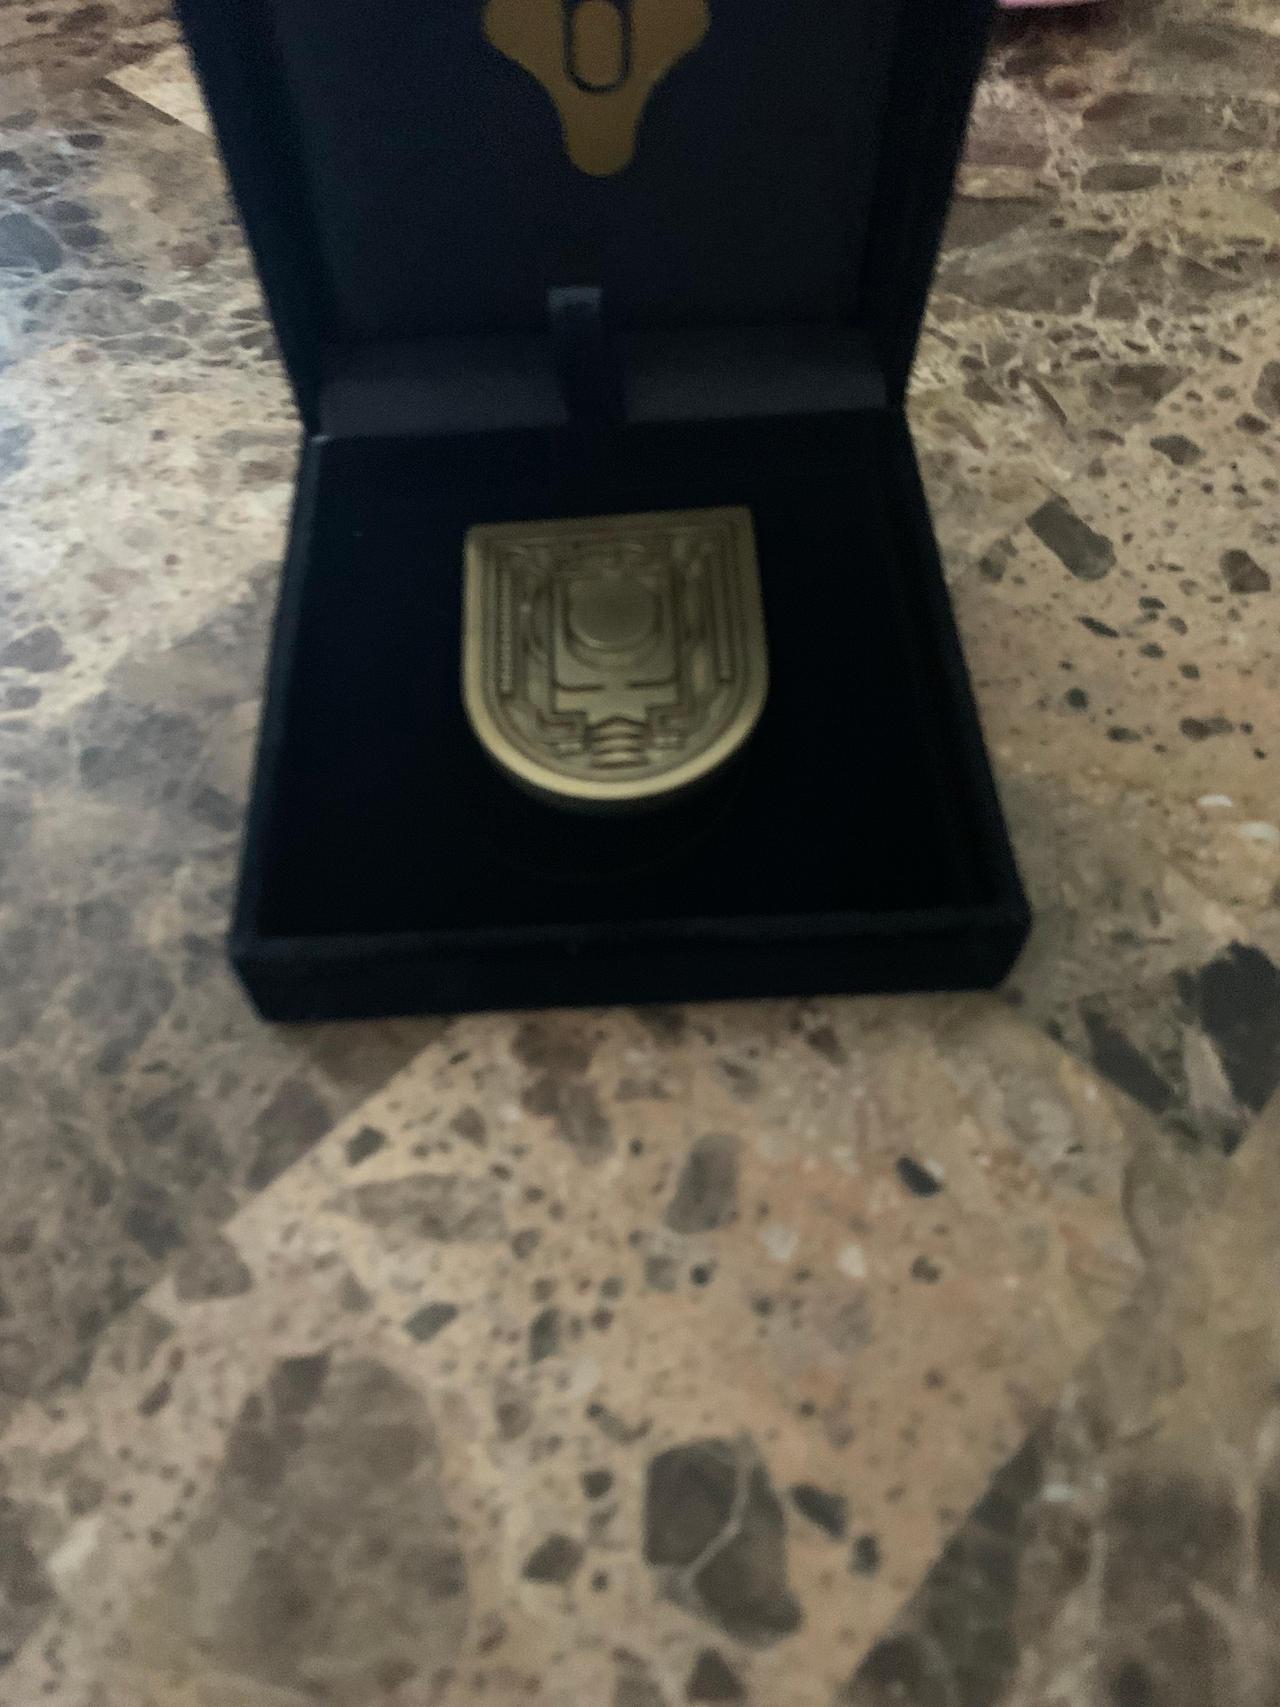 d2 chosen seal pin